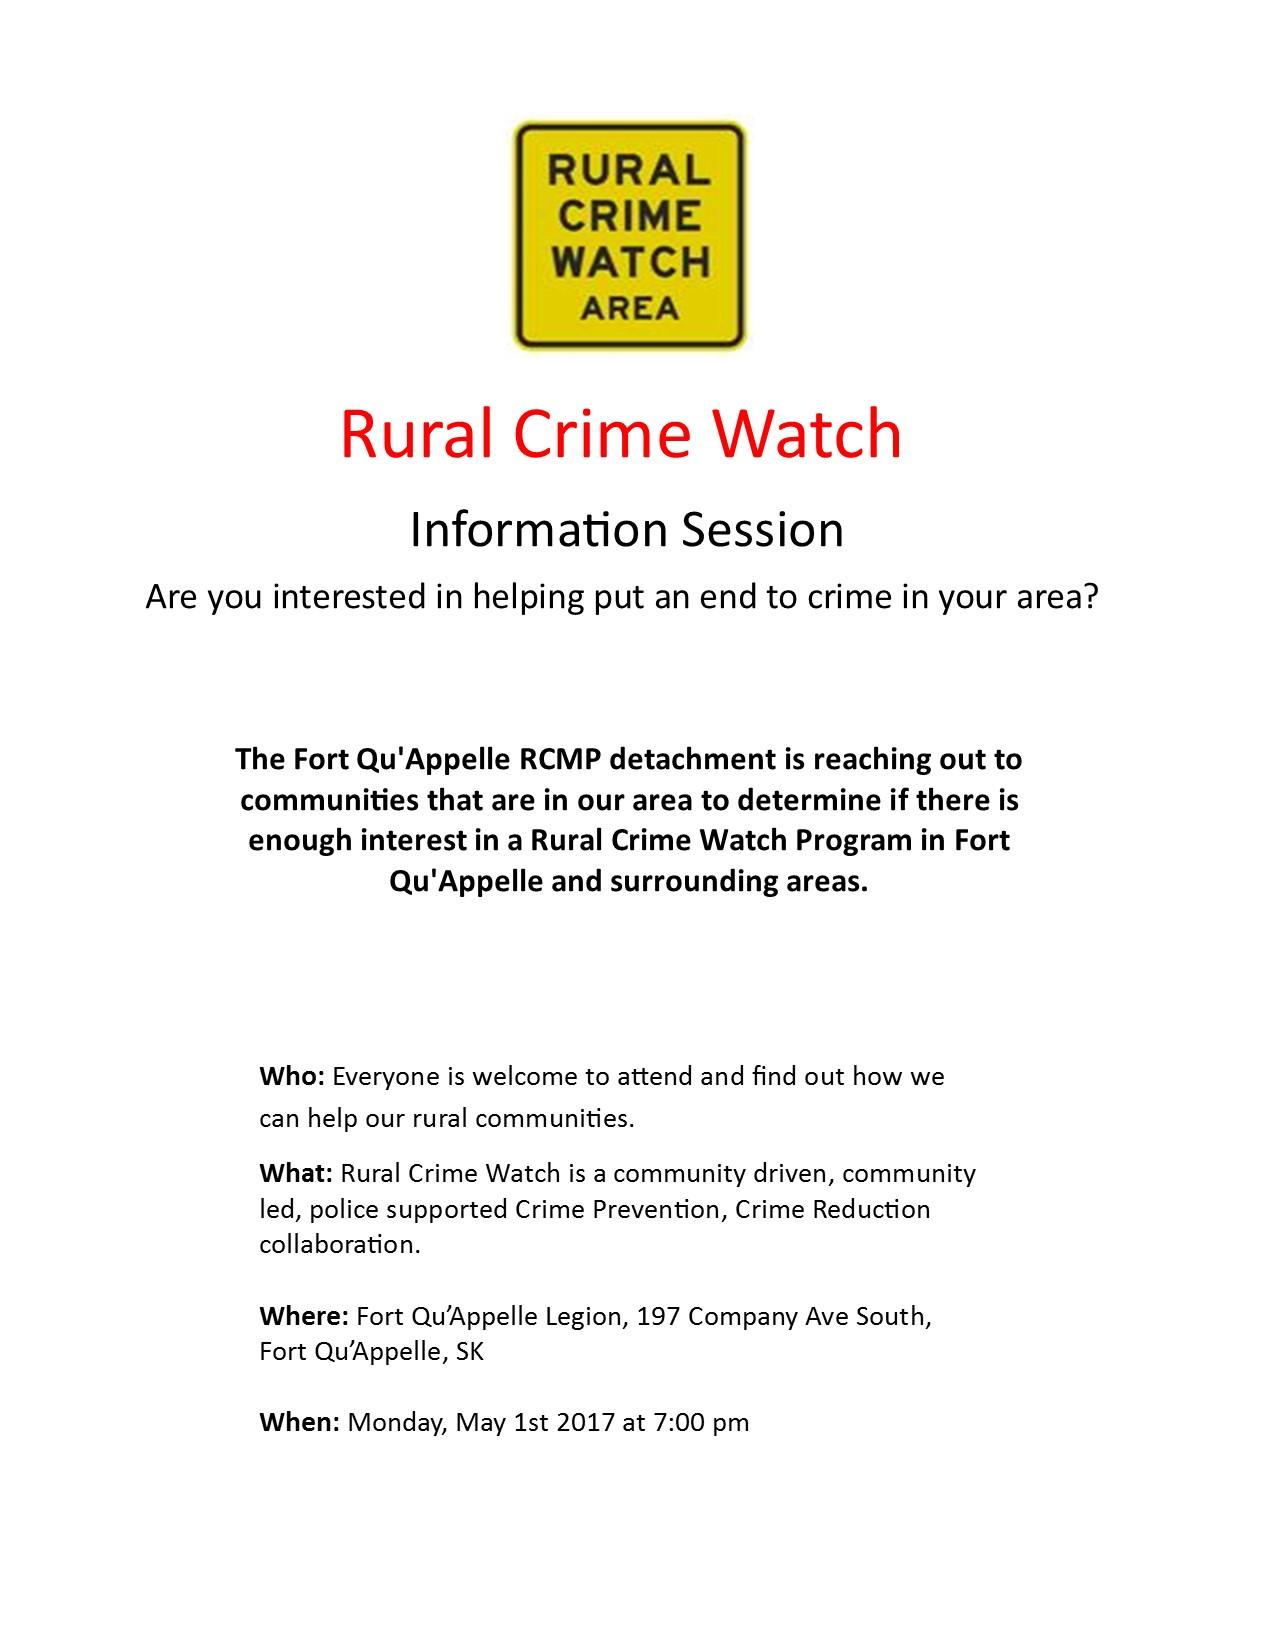 Rural Crime Watch Public Meeting @ Legion Hall @ 7:00 Pm